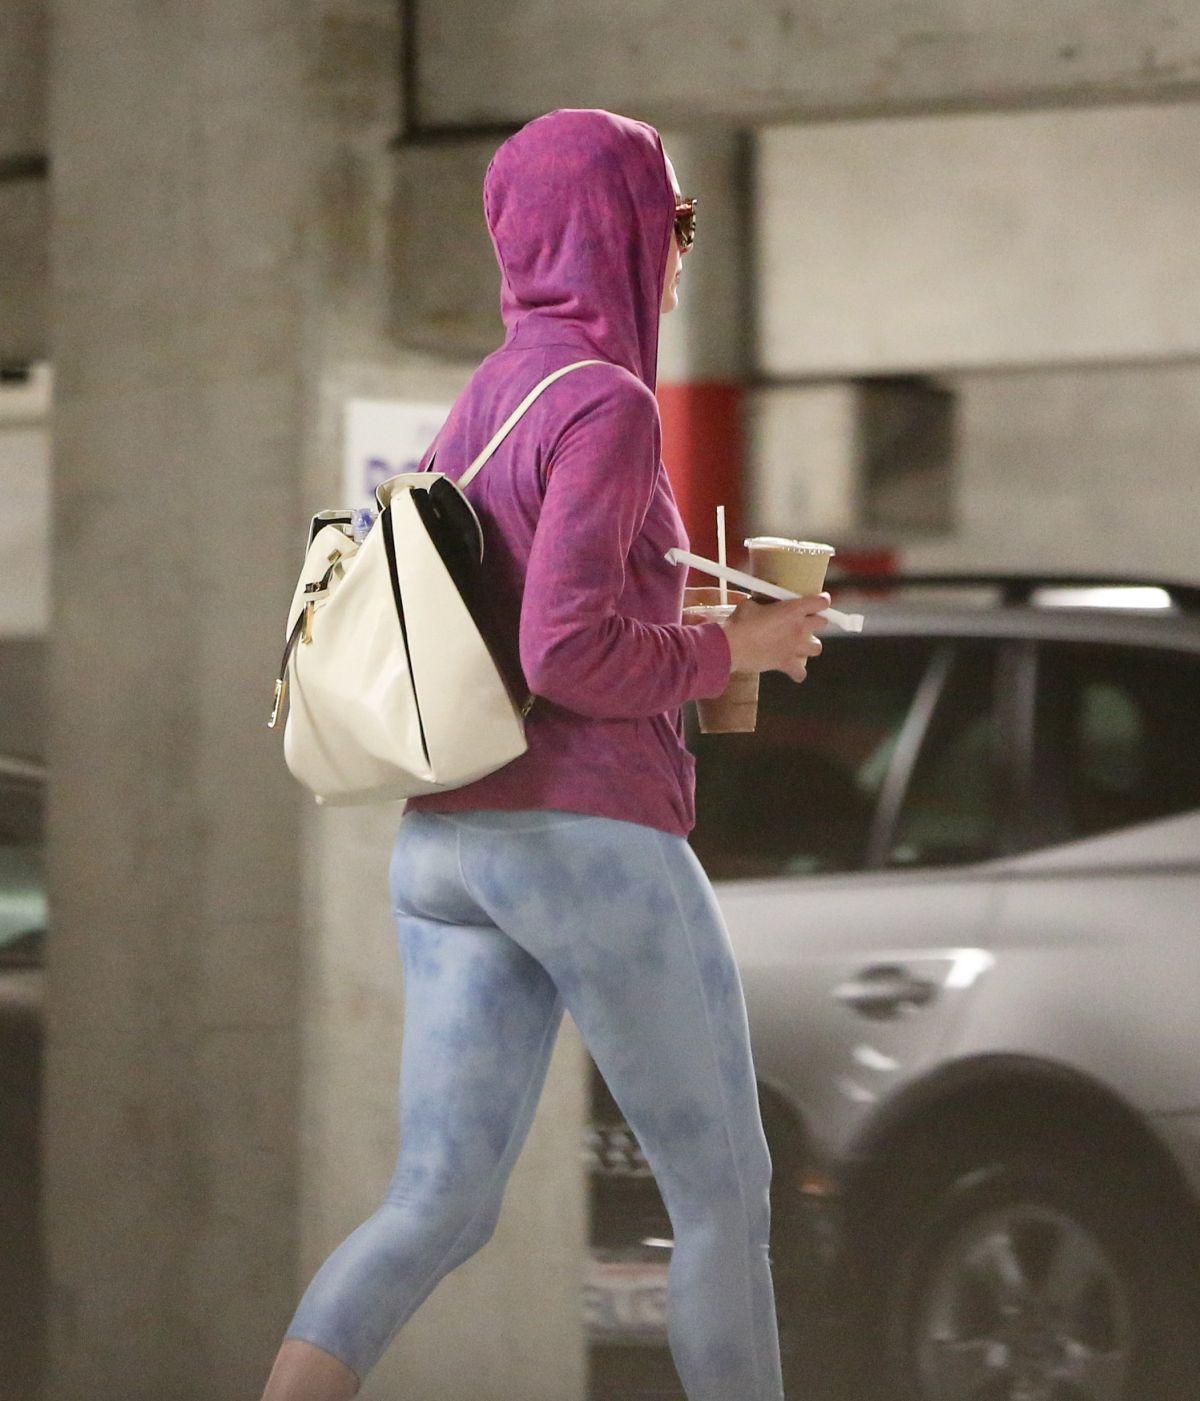 ANNE HATHAWAY In Tight Leggings